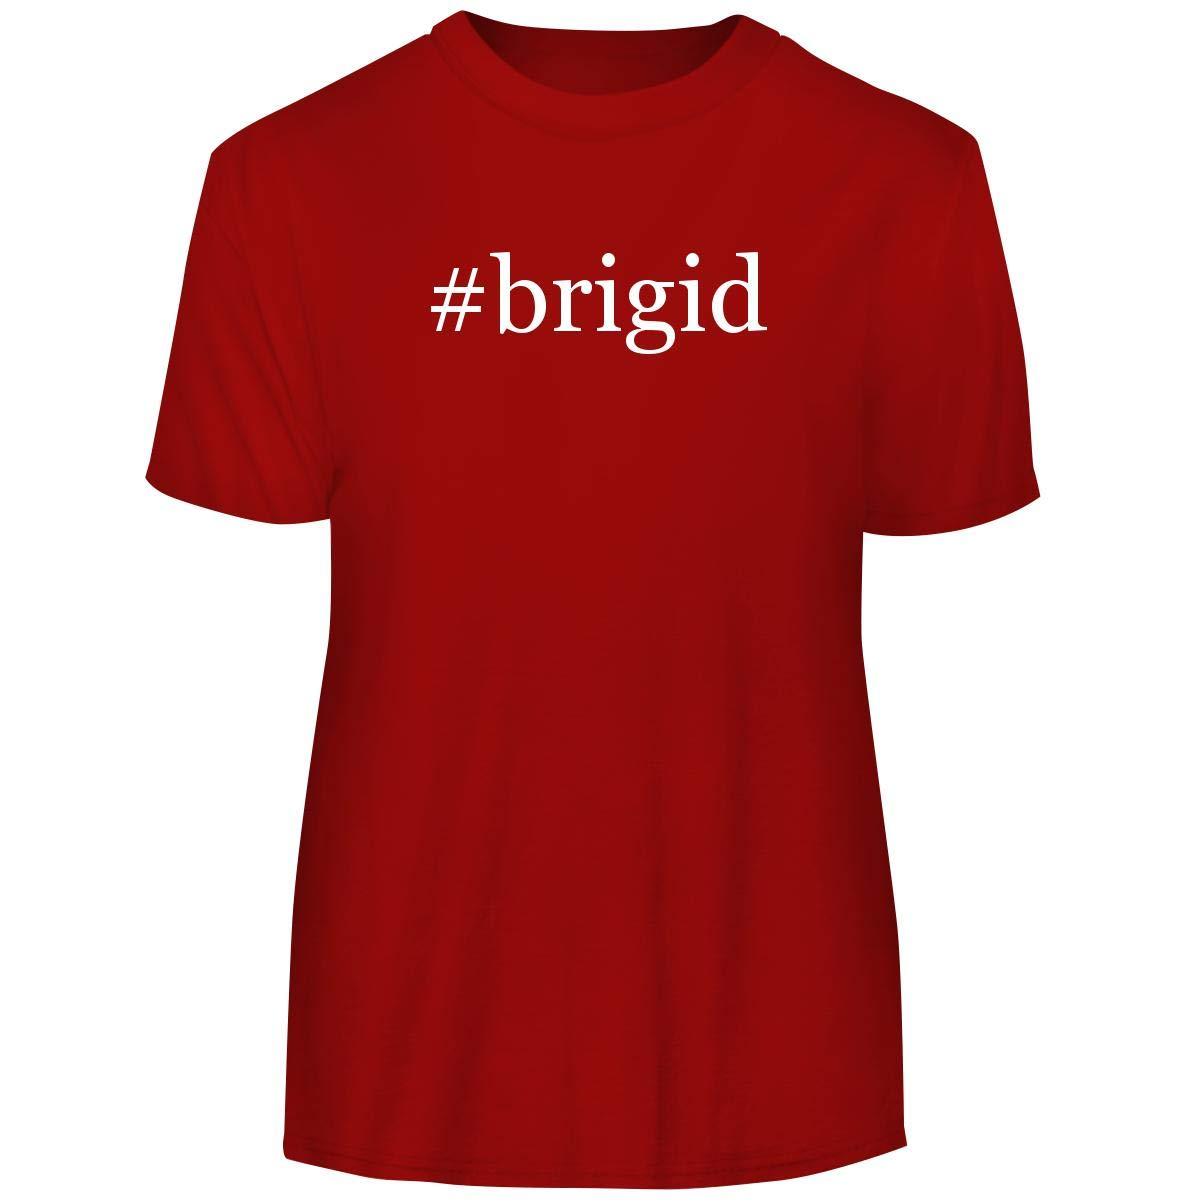 Brigid Hashtag Funny Soft Adult Tee T Shirt 1848